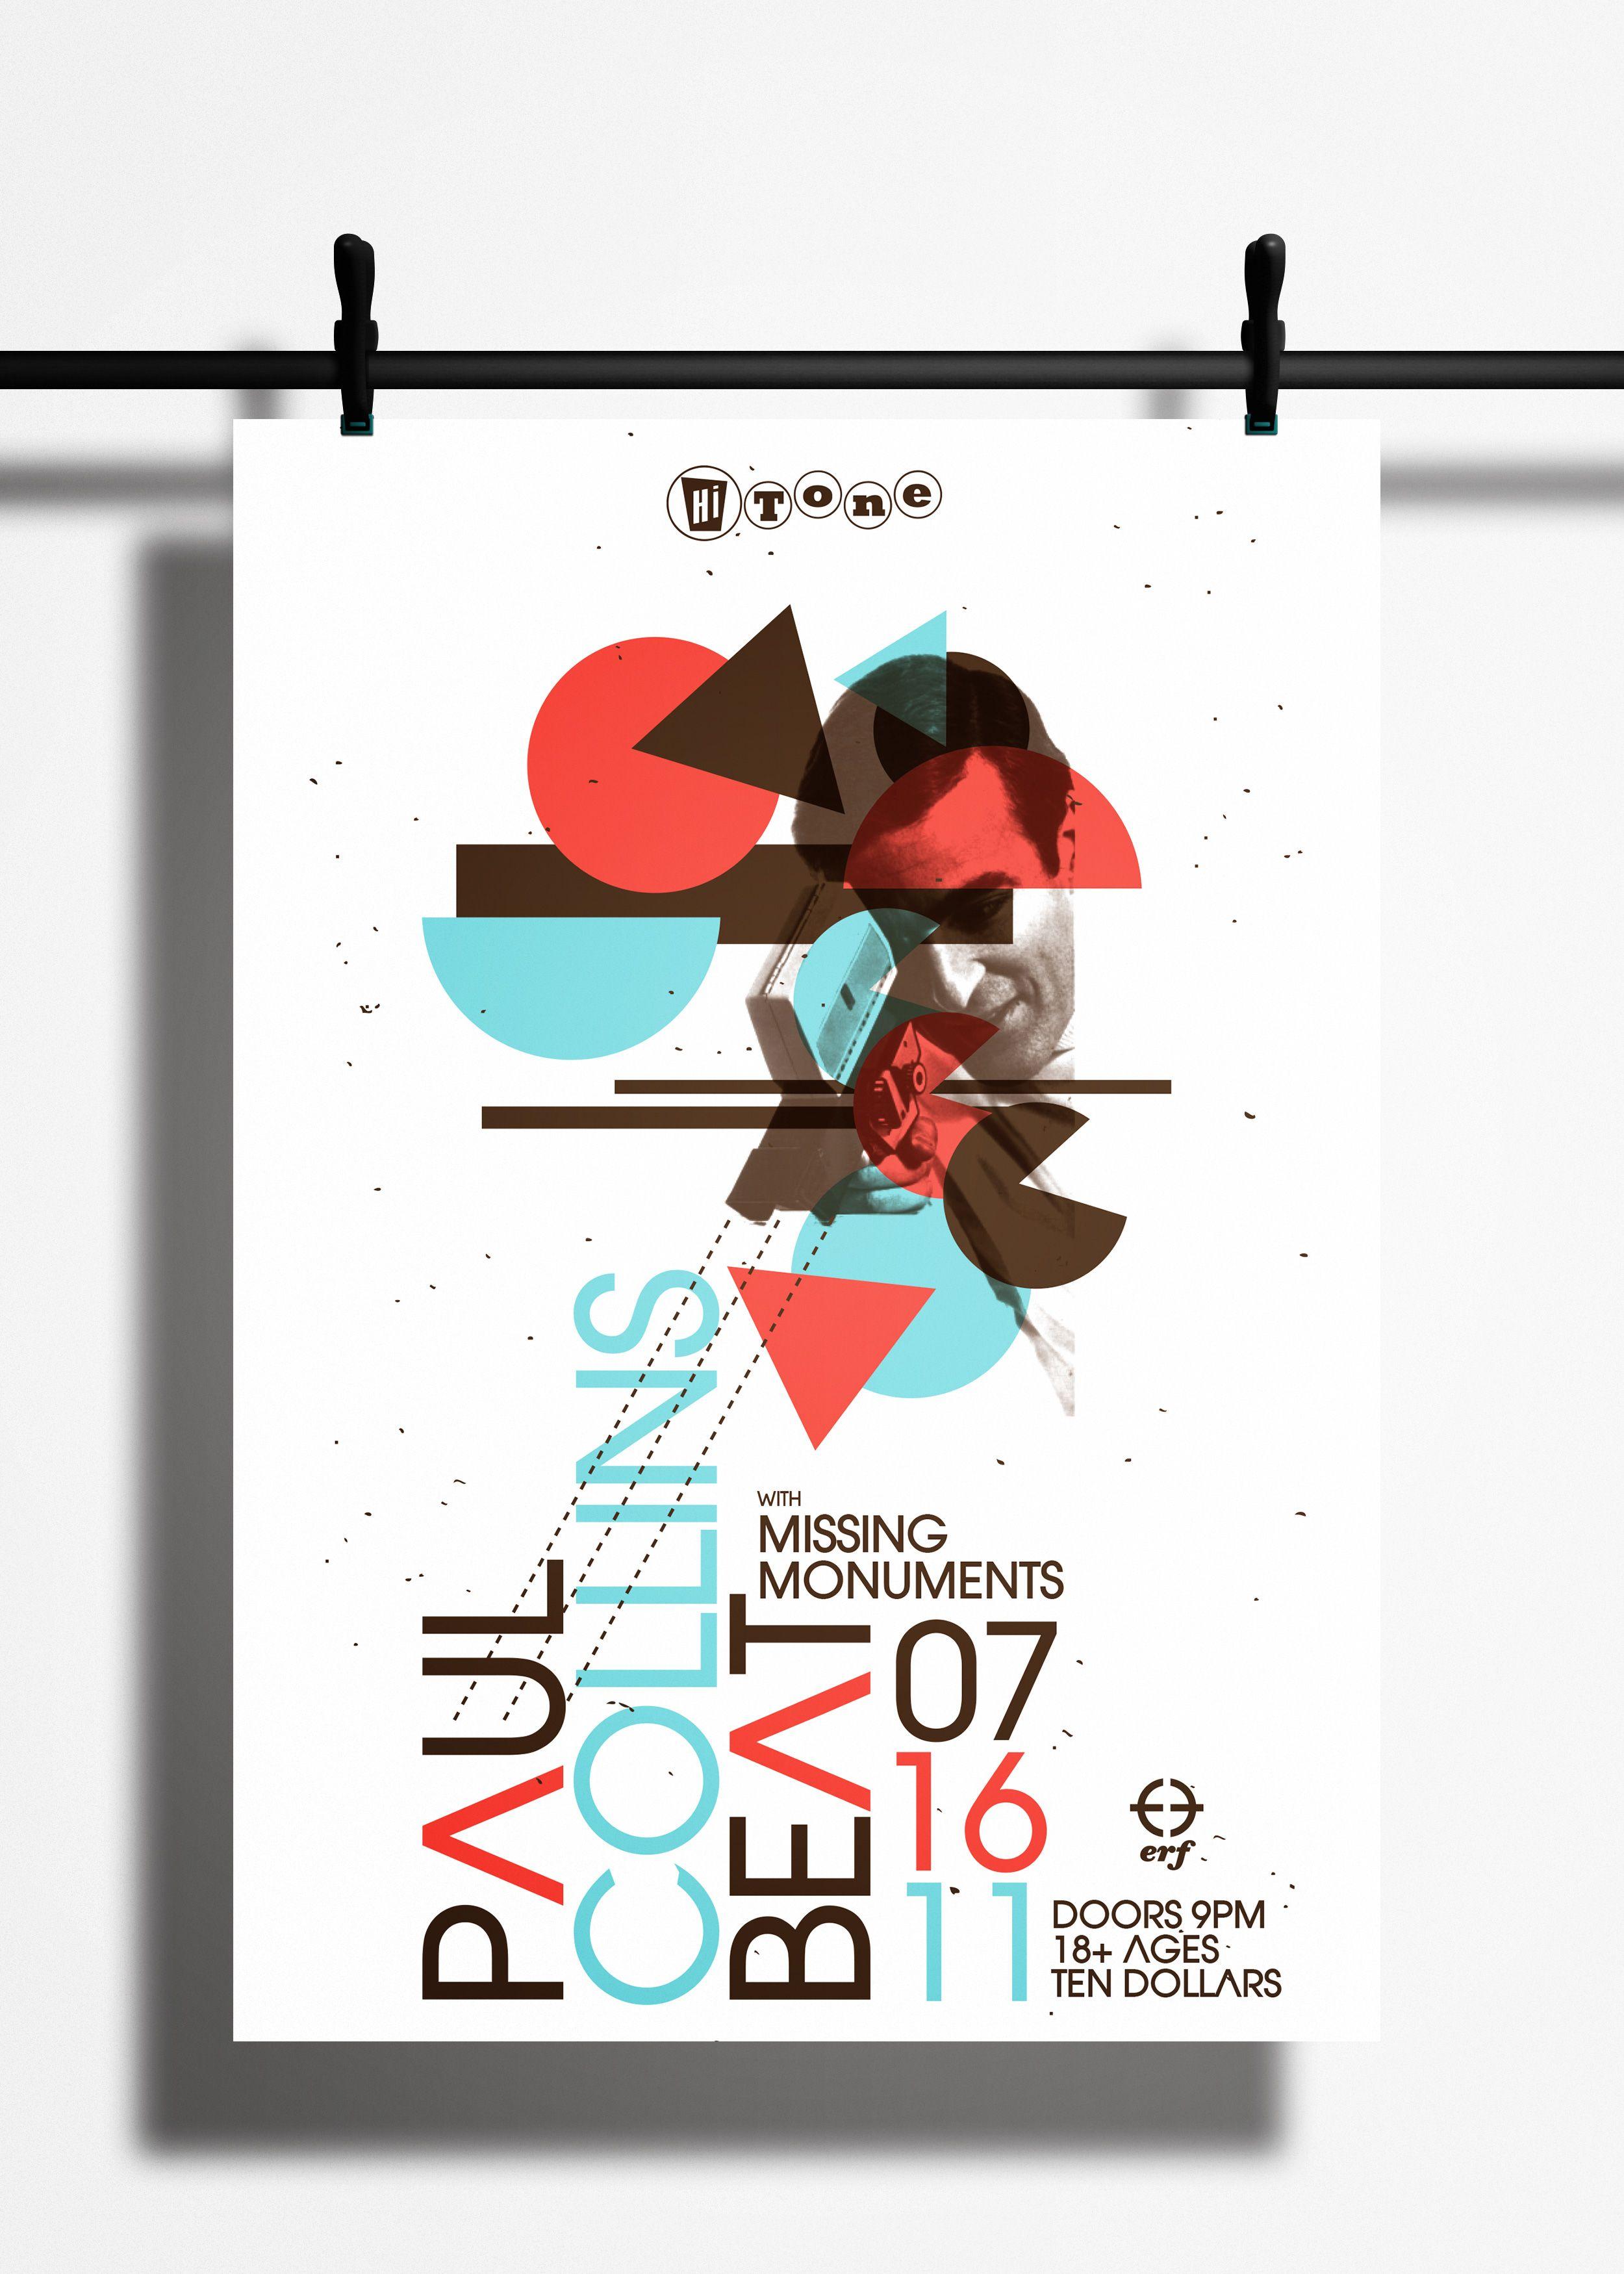 PaulCollins_Flyer_Poster_Mockup_01.jpg